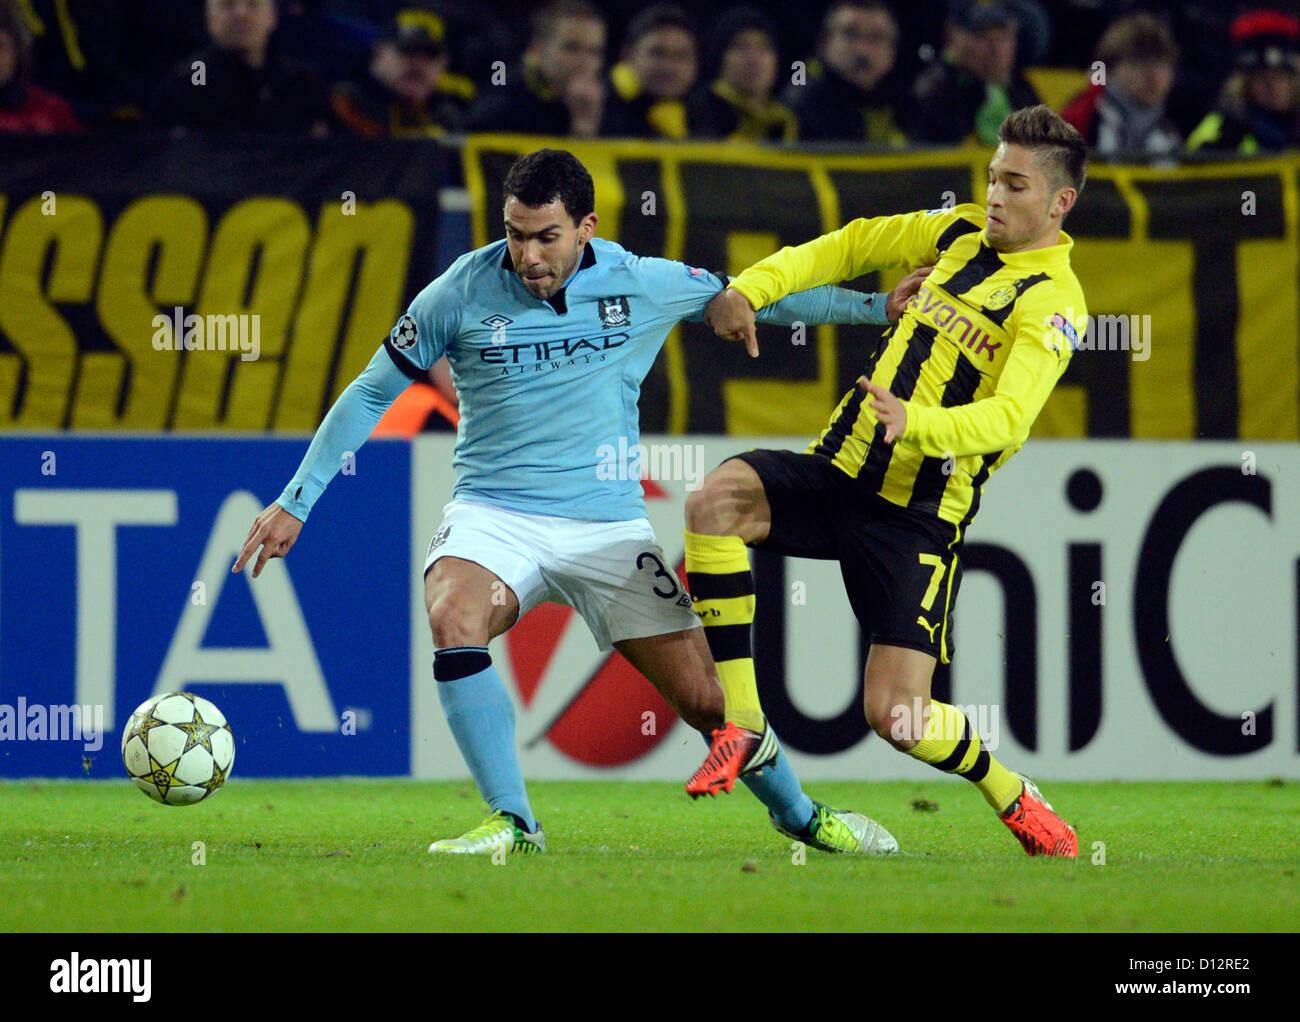 Carlos Dortmund dortmund s moritz leitner r and carlos tevez of manchester vie for